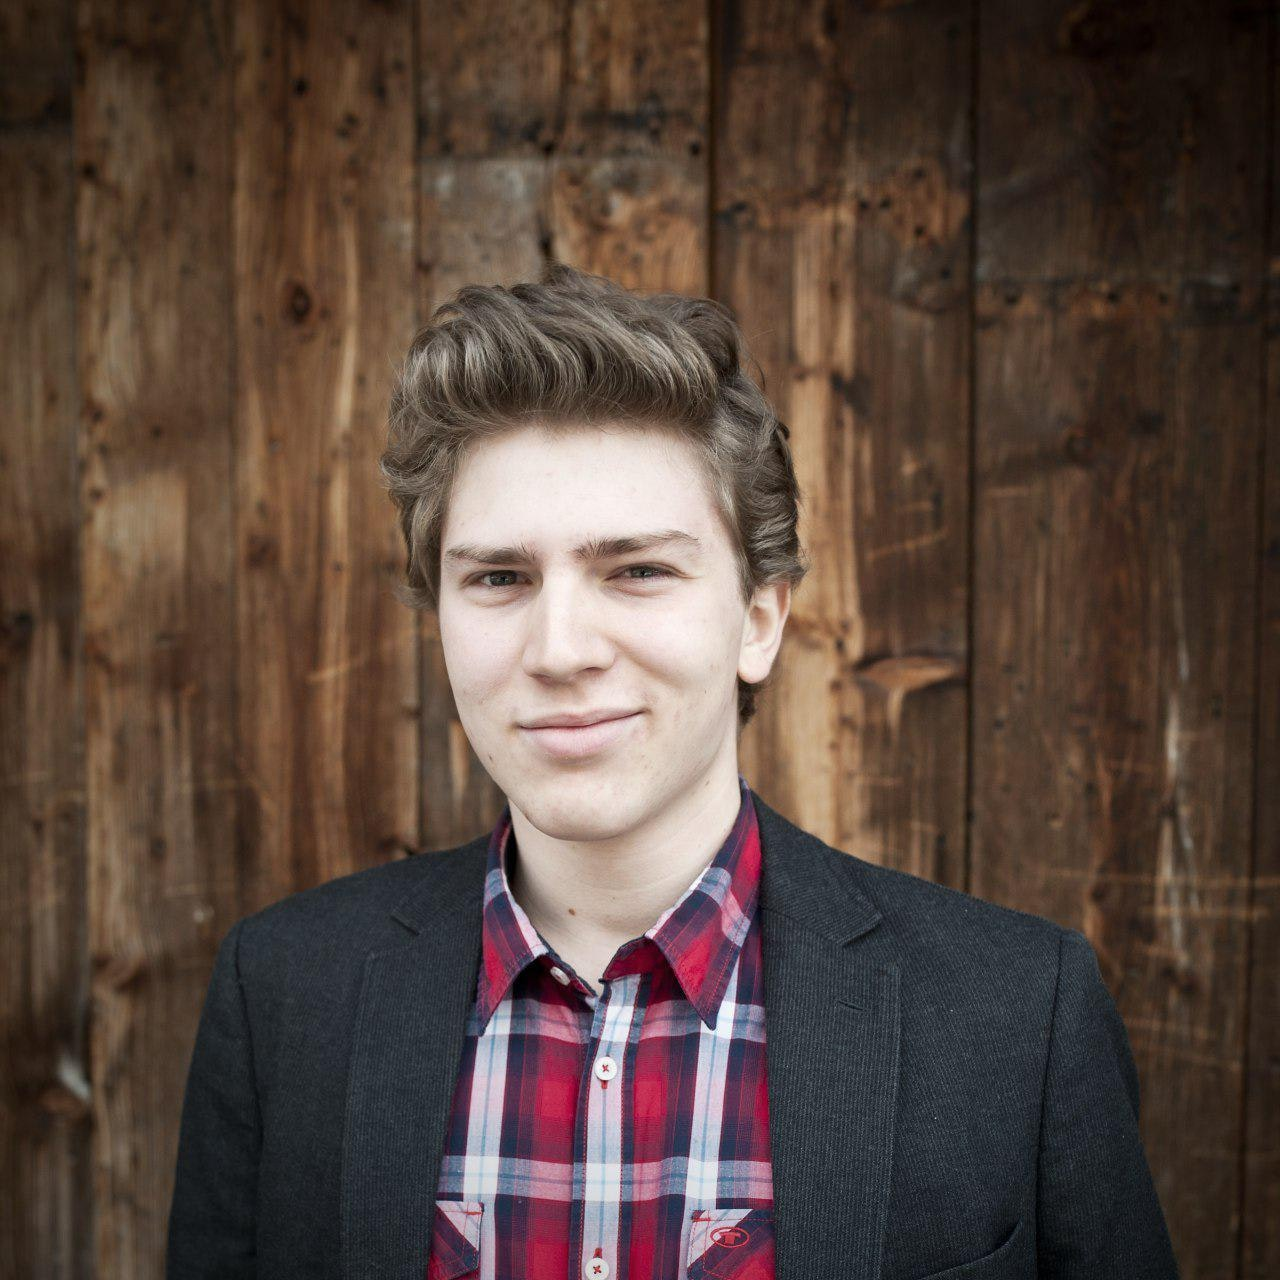 Go to Lukas Wibmer's profile